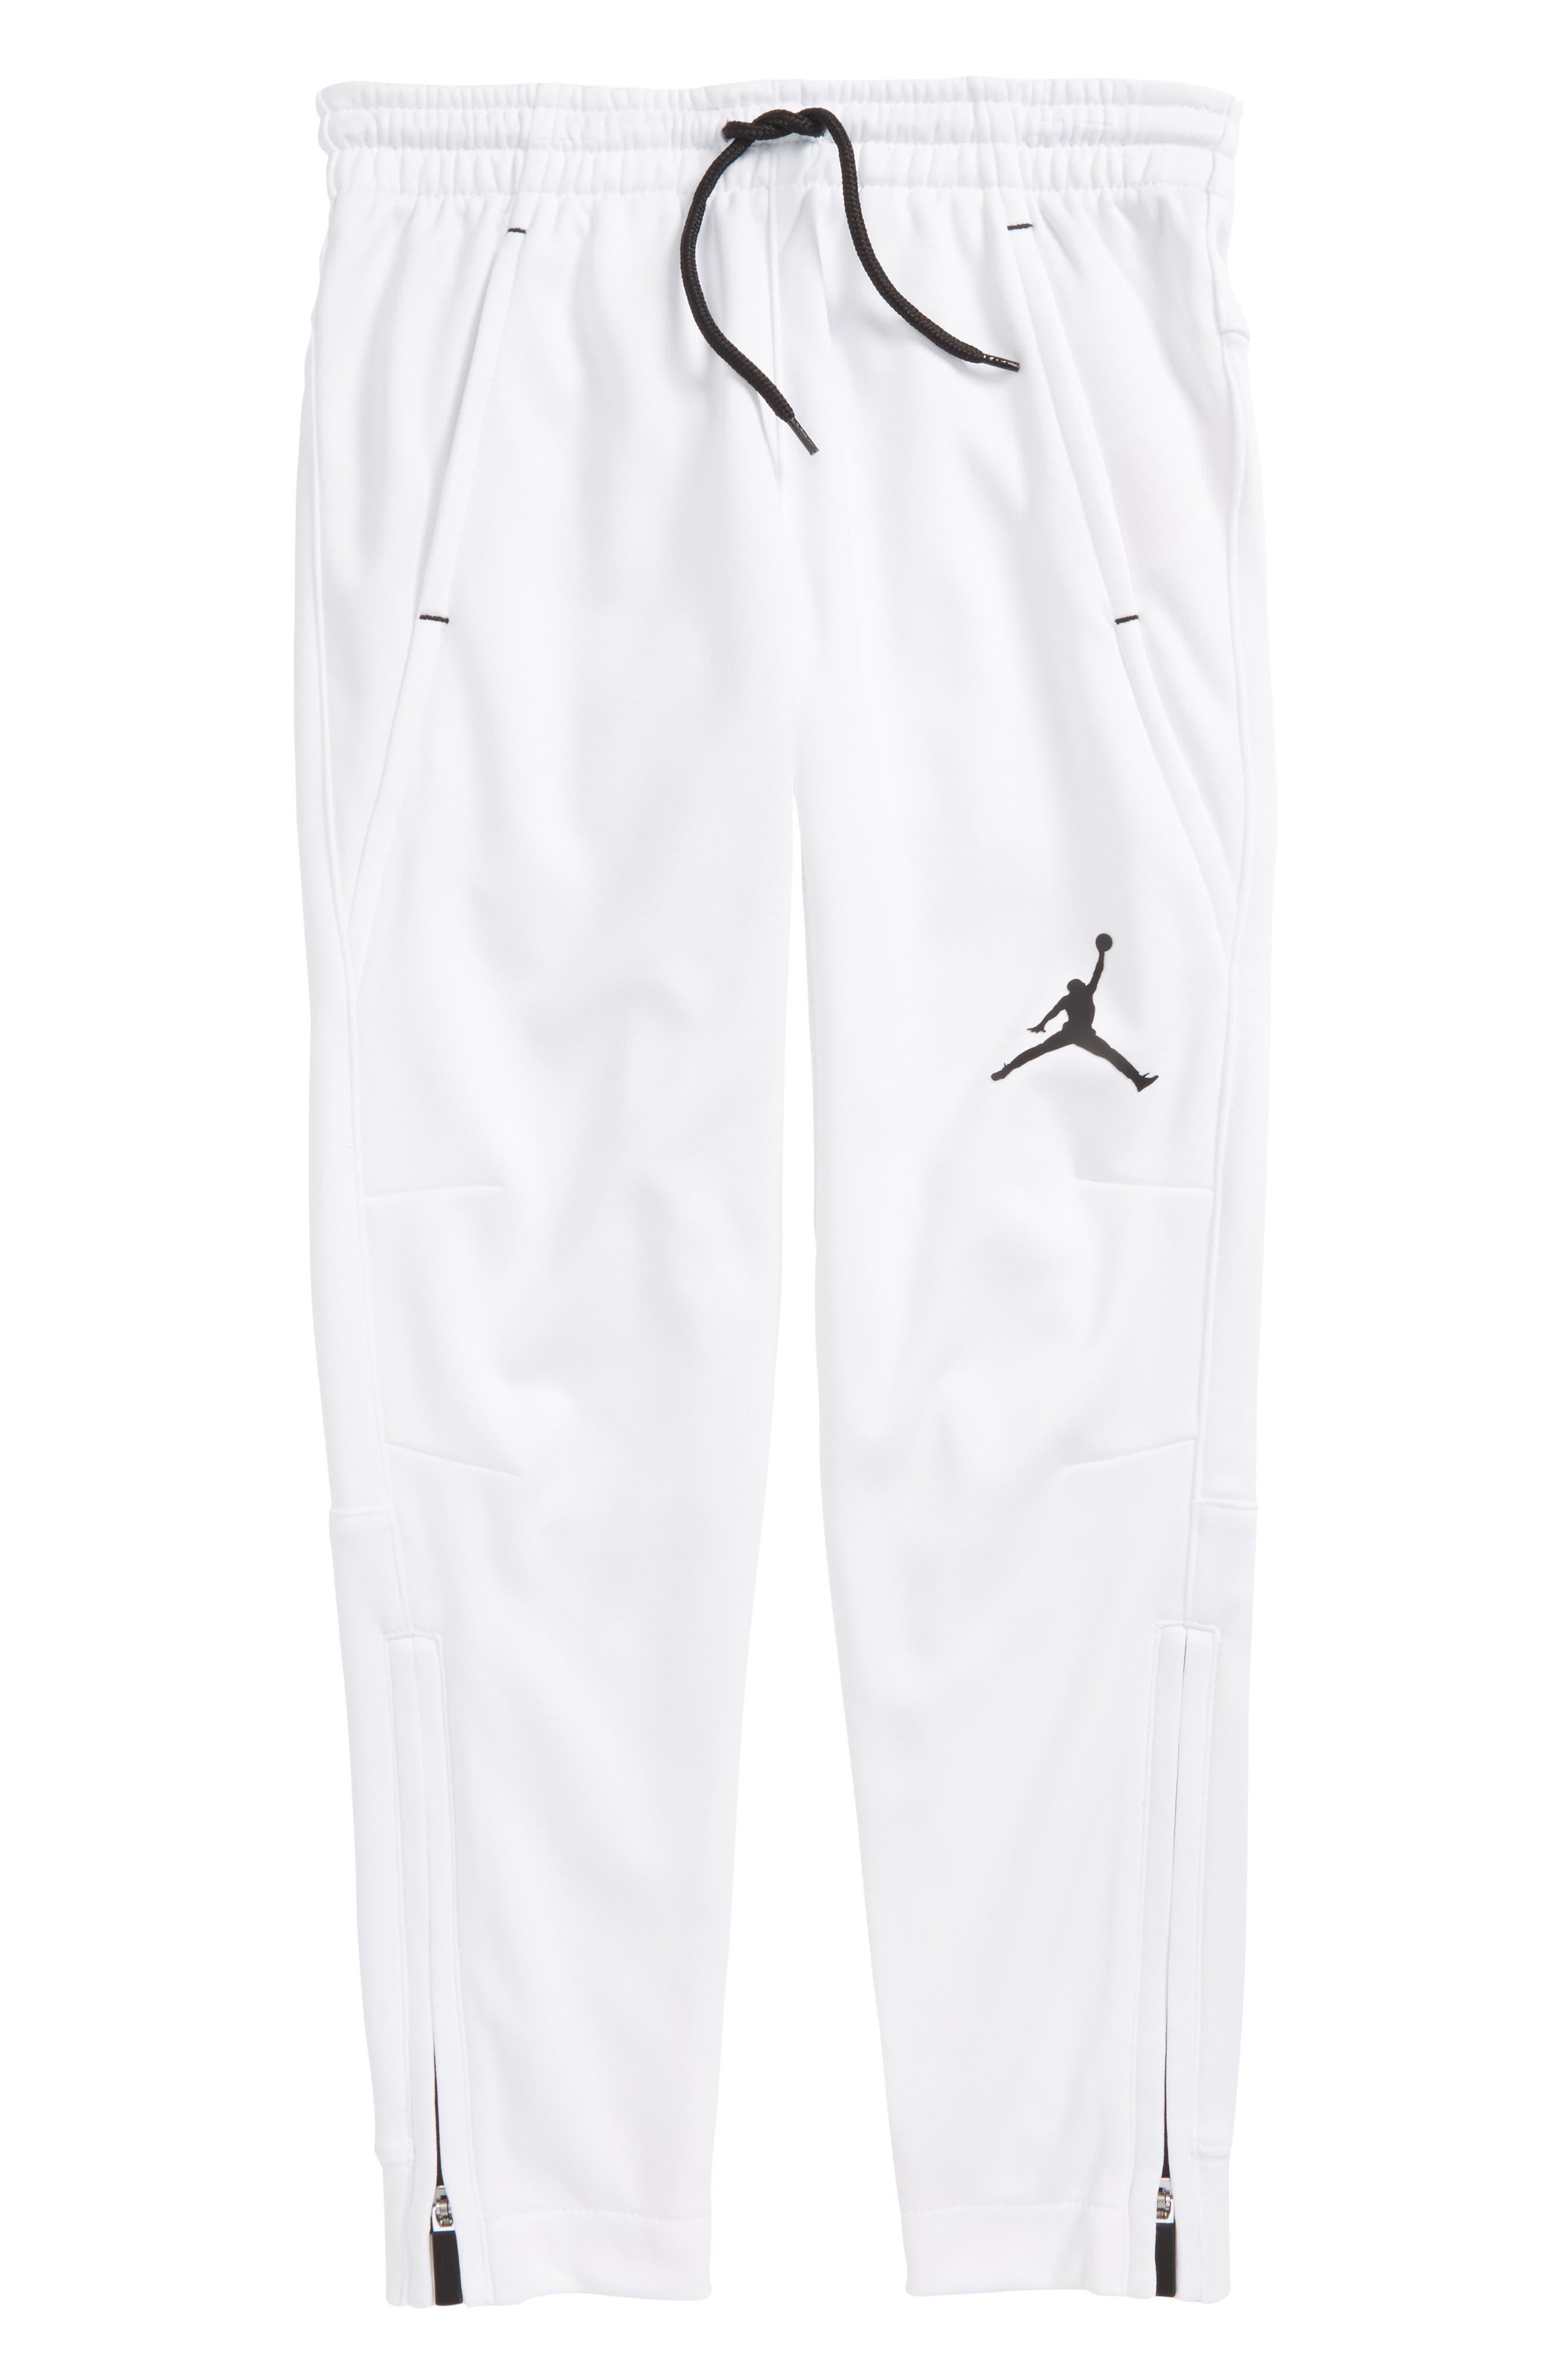 Jordan Dry 23 Alpha Sweatpants,                             Main thumbnail 1, color,                             100